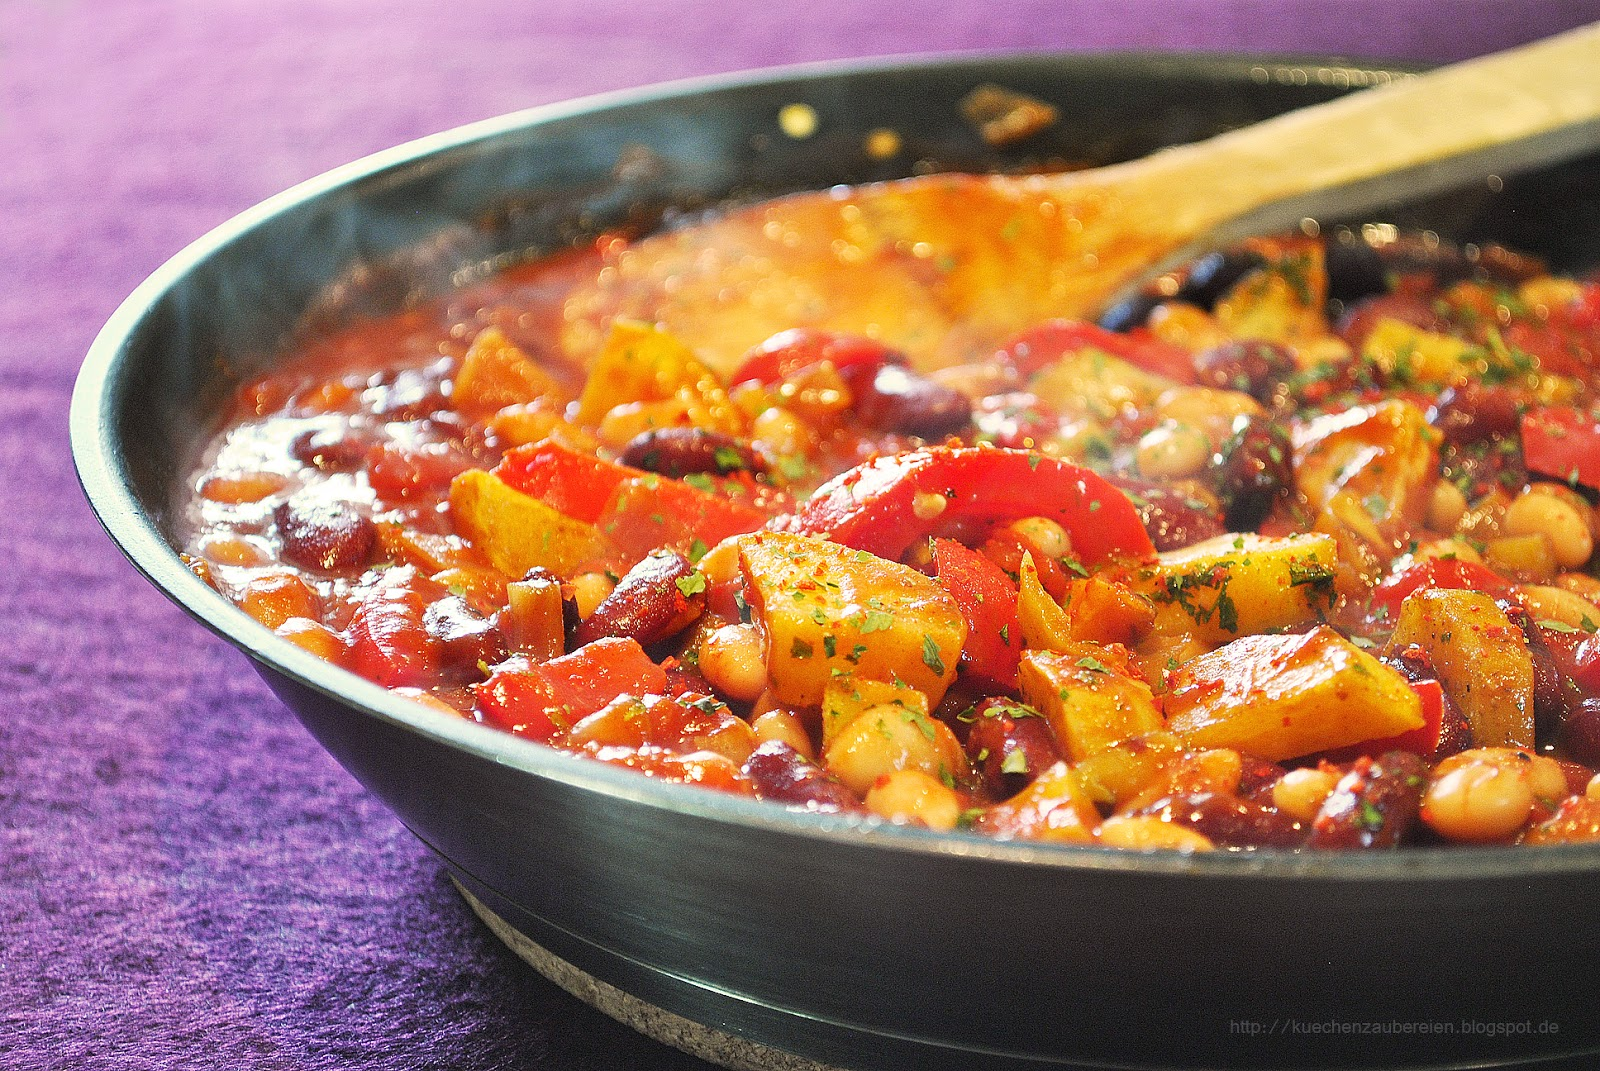 Jamie Oliver 30 Minuten Rezepte Vegetarische Nudelschnecken Rotolo